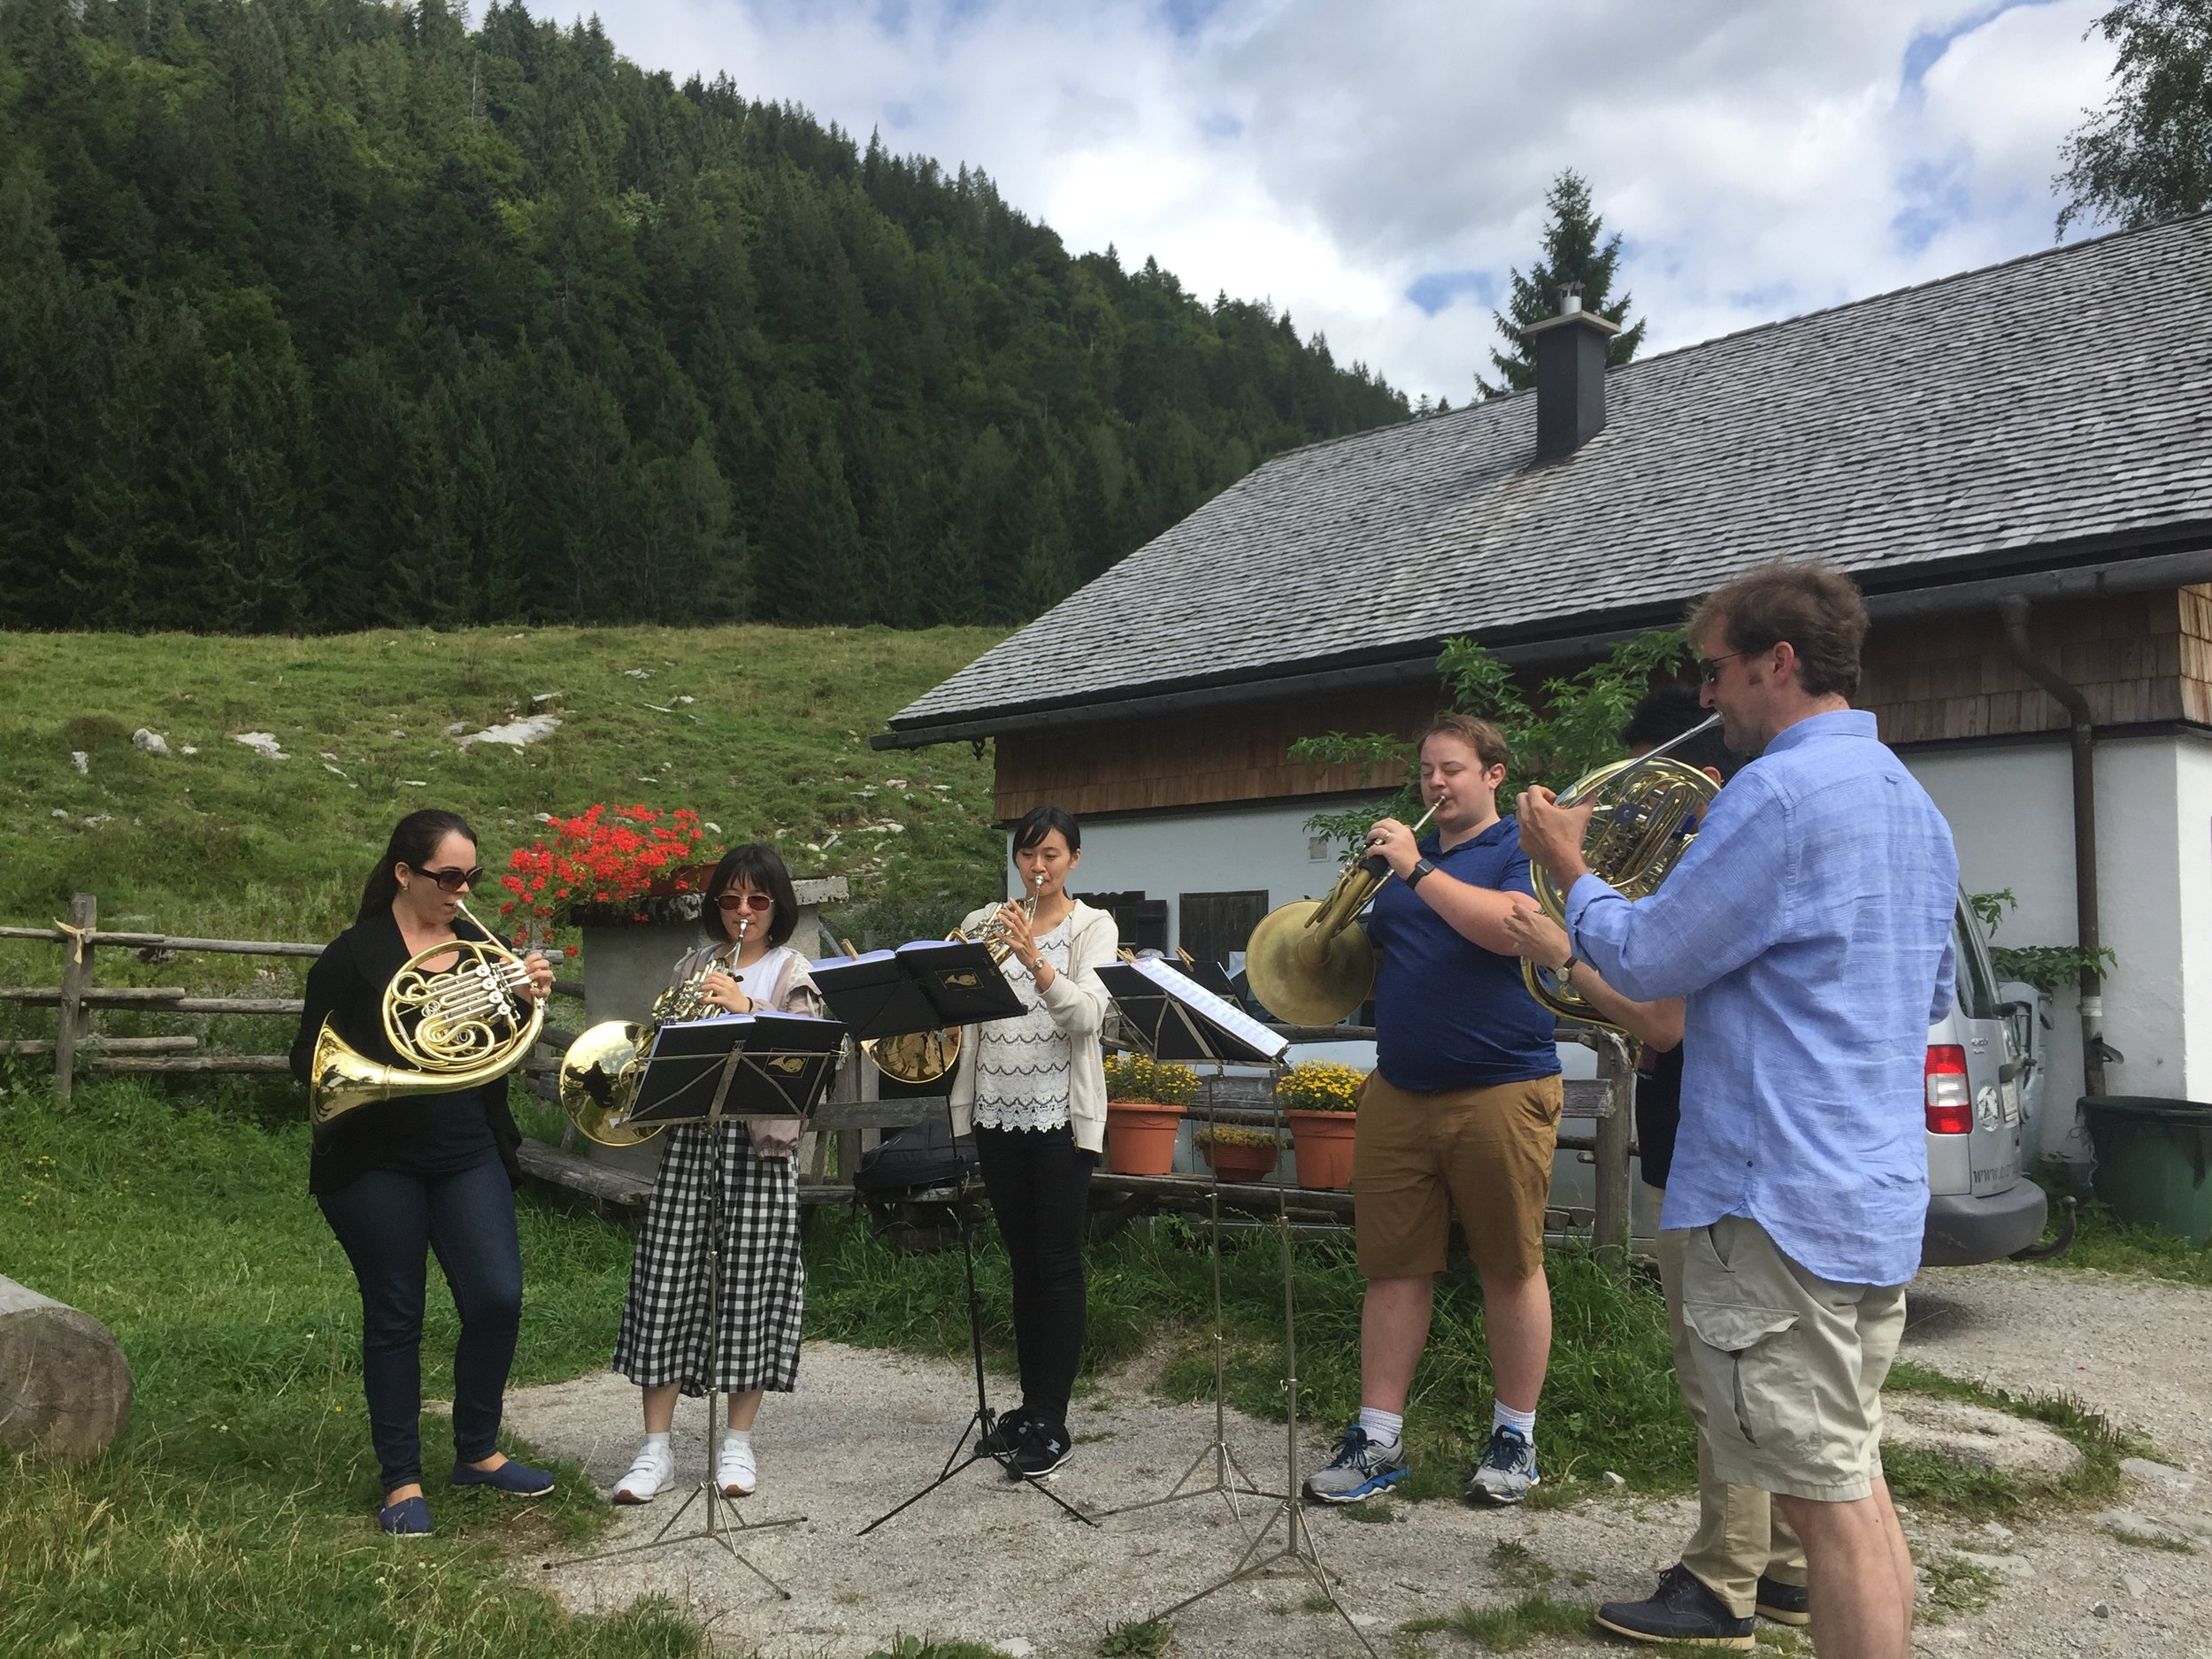 Horn Quartets/Sextets led by our fearless leader Johannes Hinterhölzer